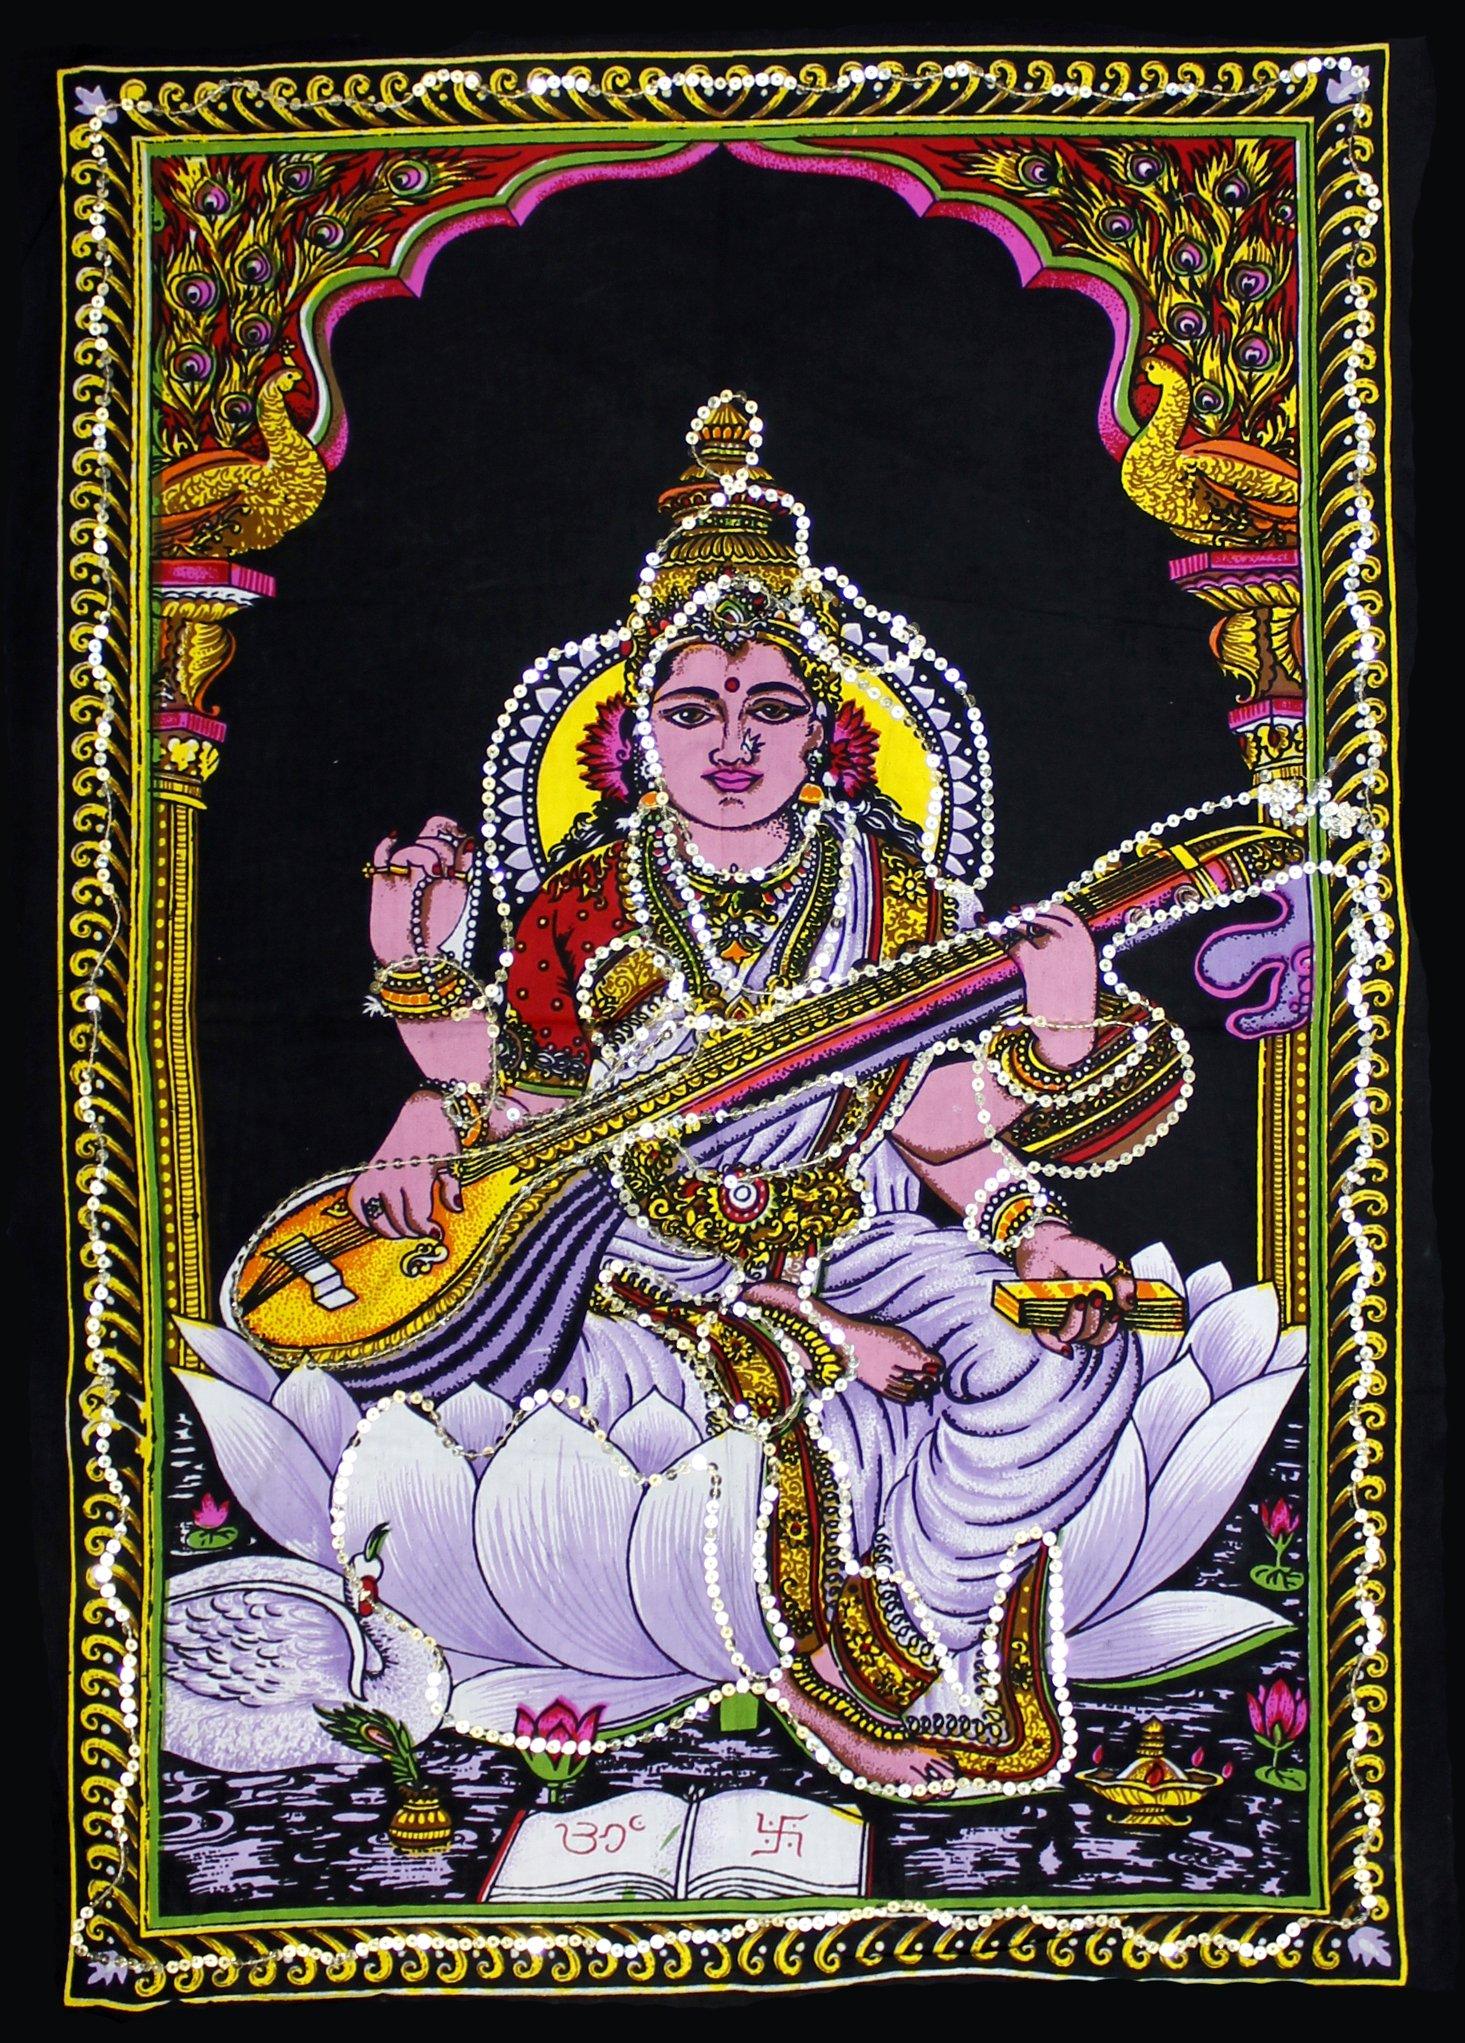 Krishna Mart India Cotton Canvas Sequin Batik Goddess Saraswati 22'' X 16'' Tapestry (Small)